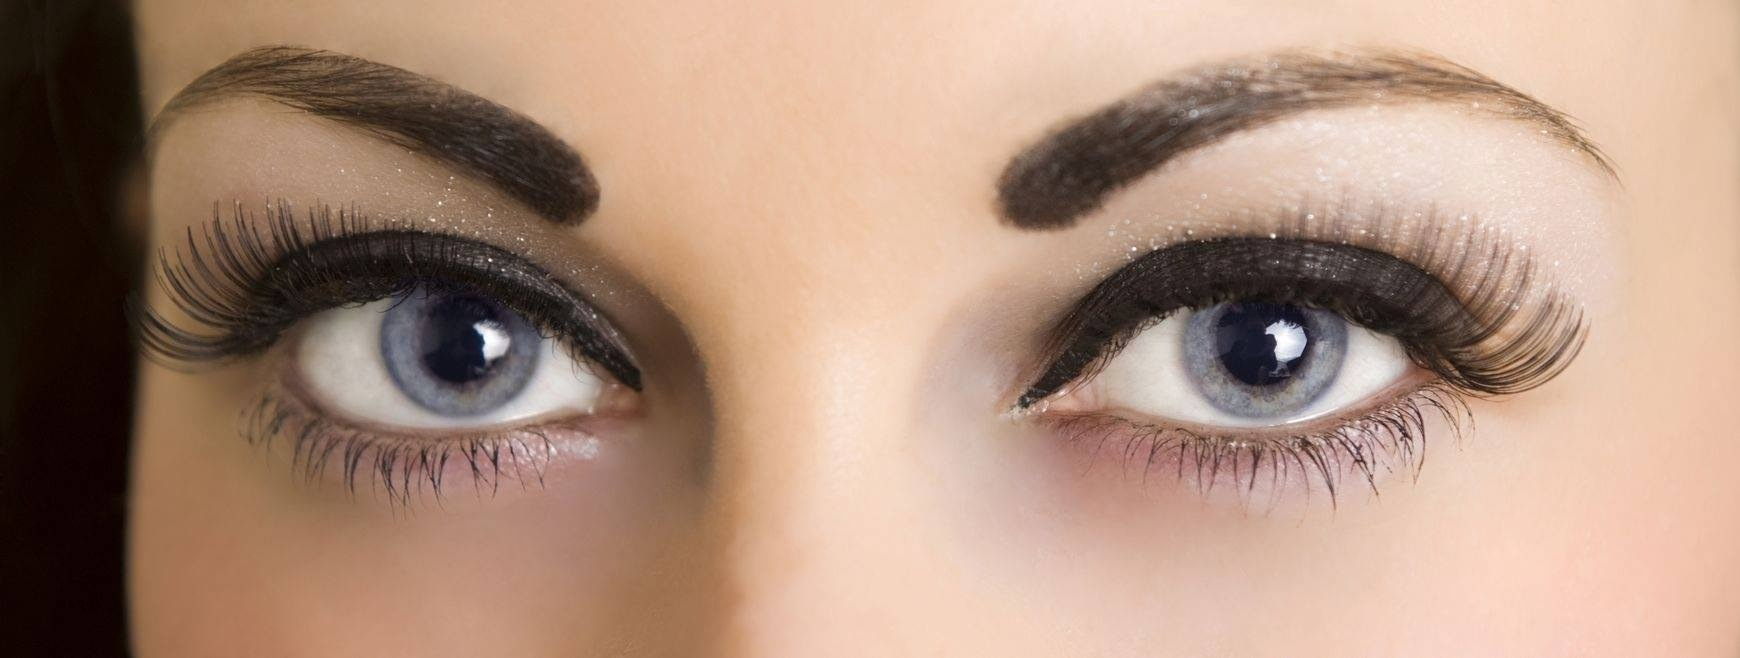 LVL Lashes – Better than Eyelash Extensions?